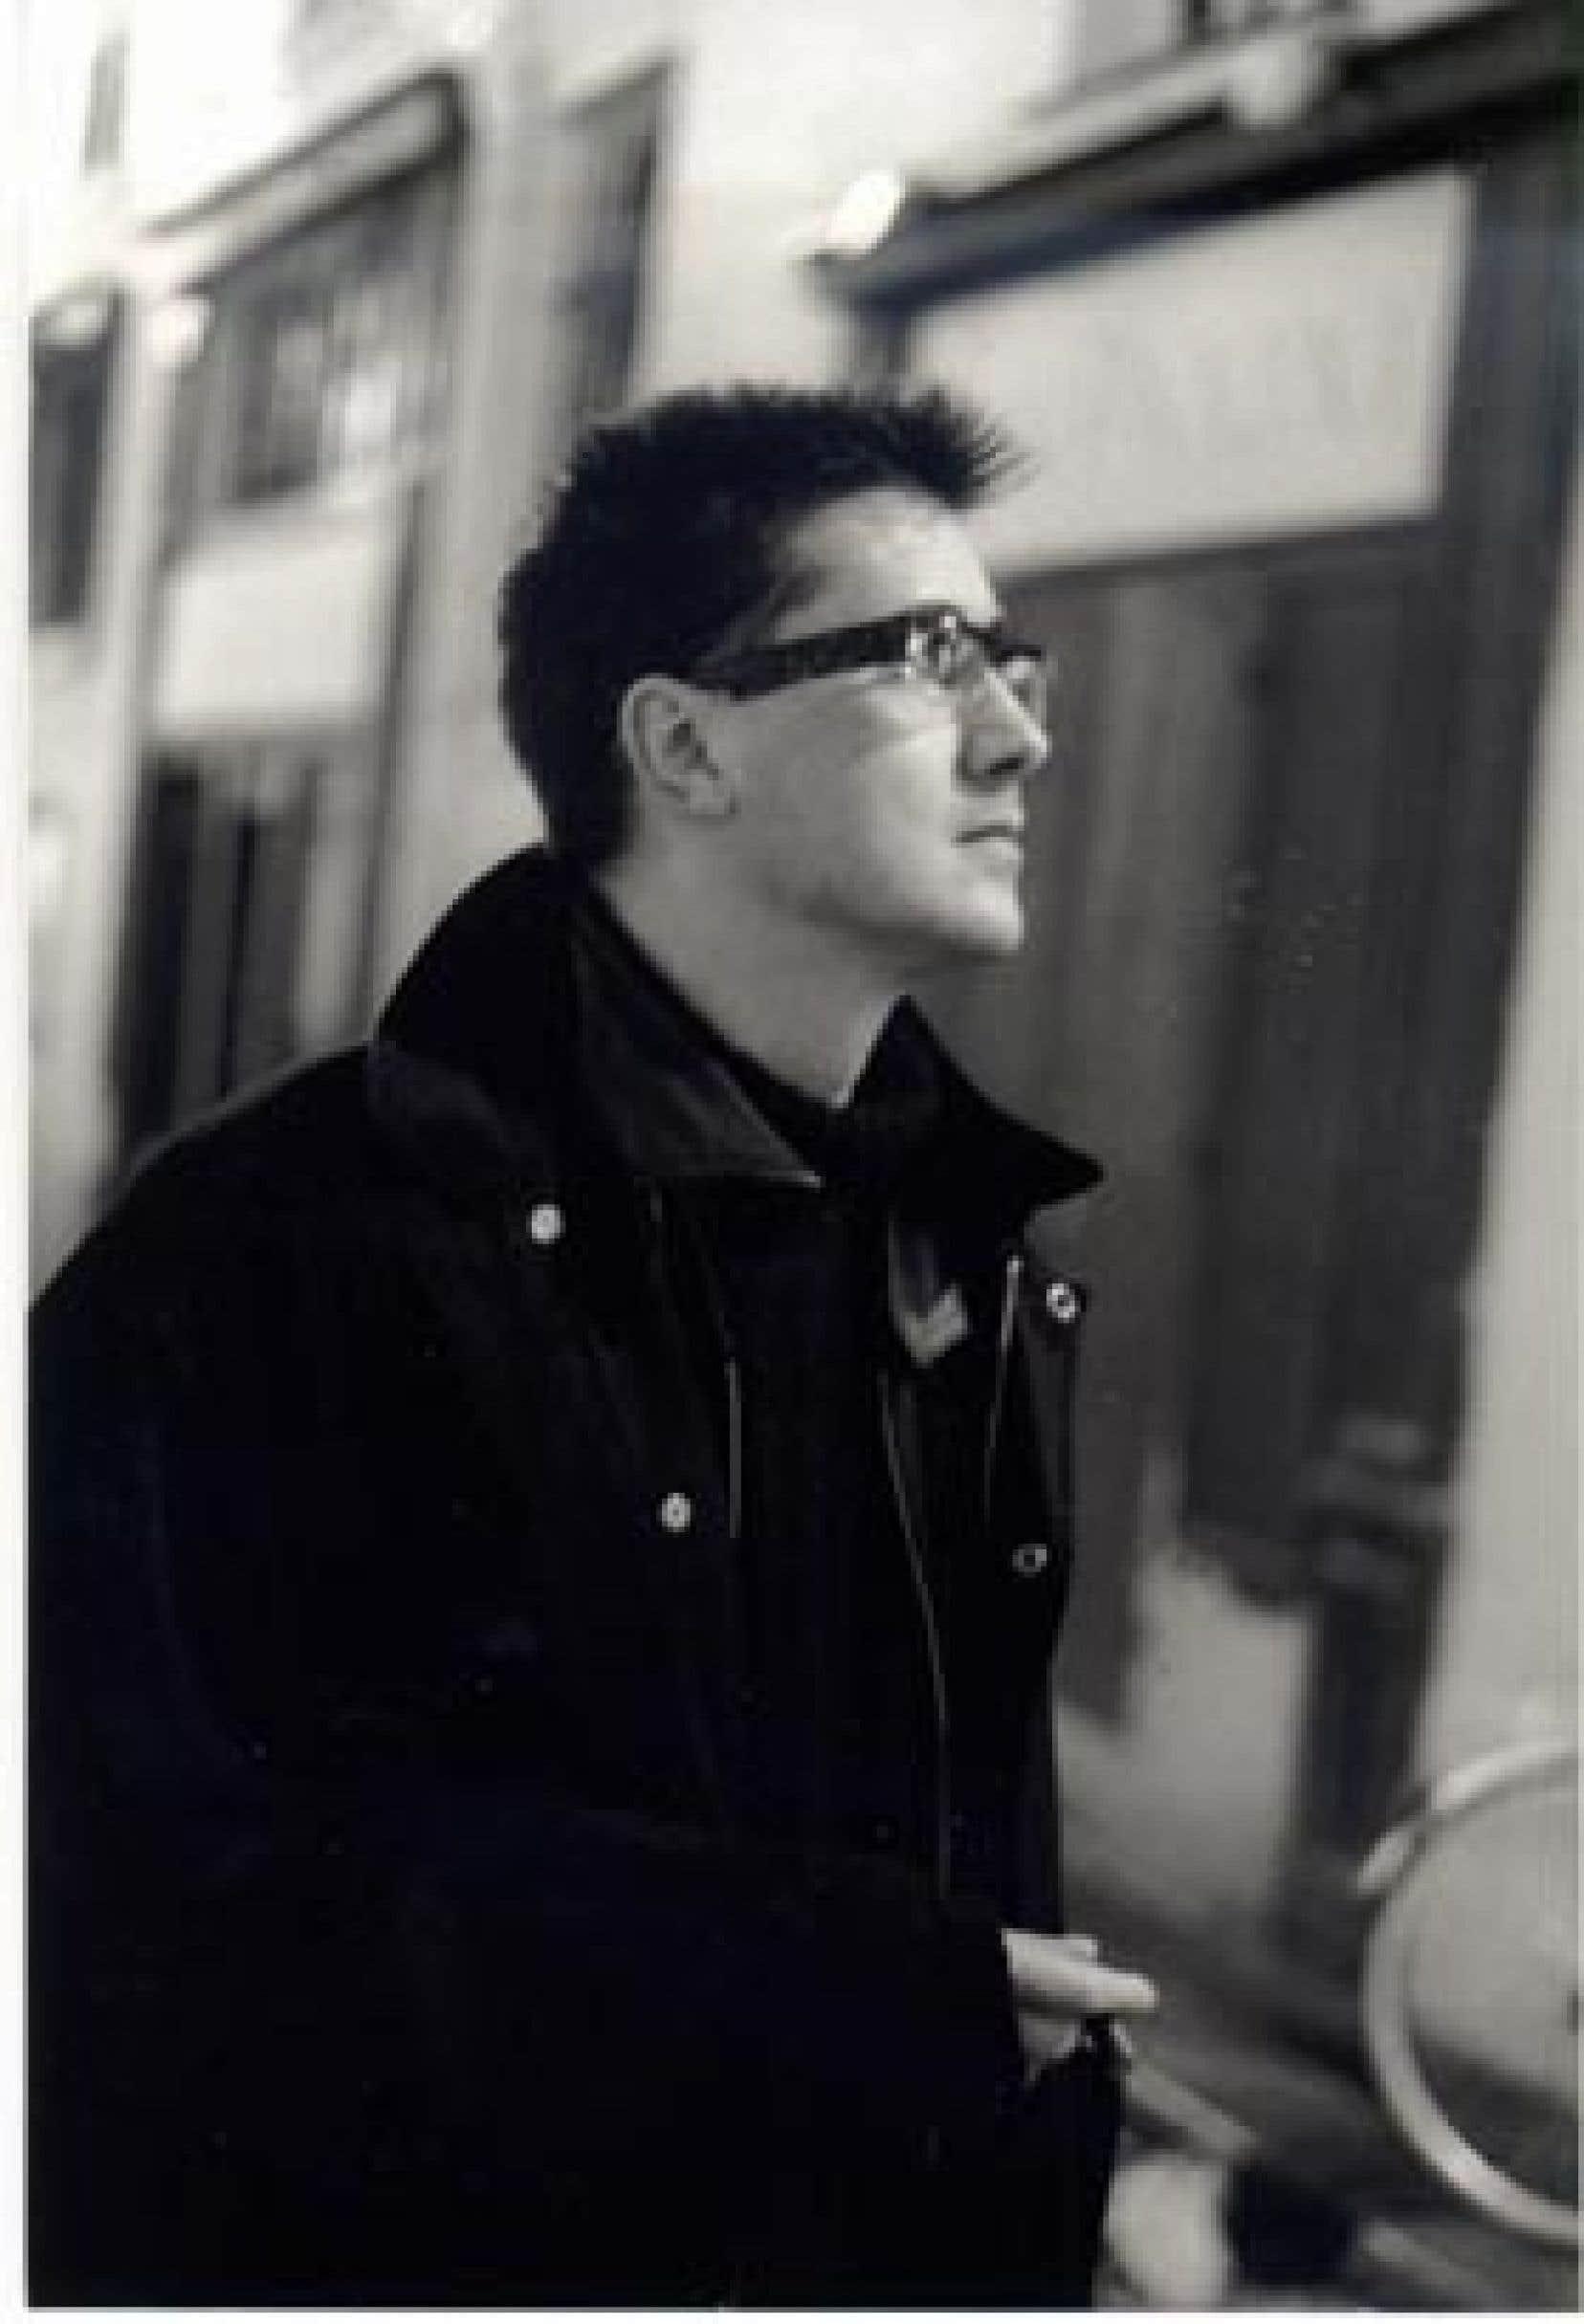 Paul M. Marchand en 2003